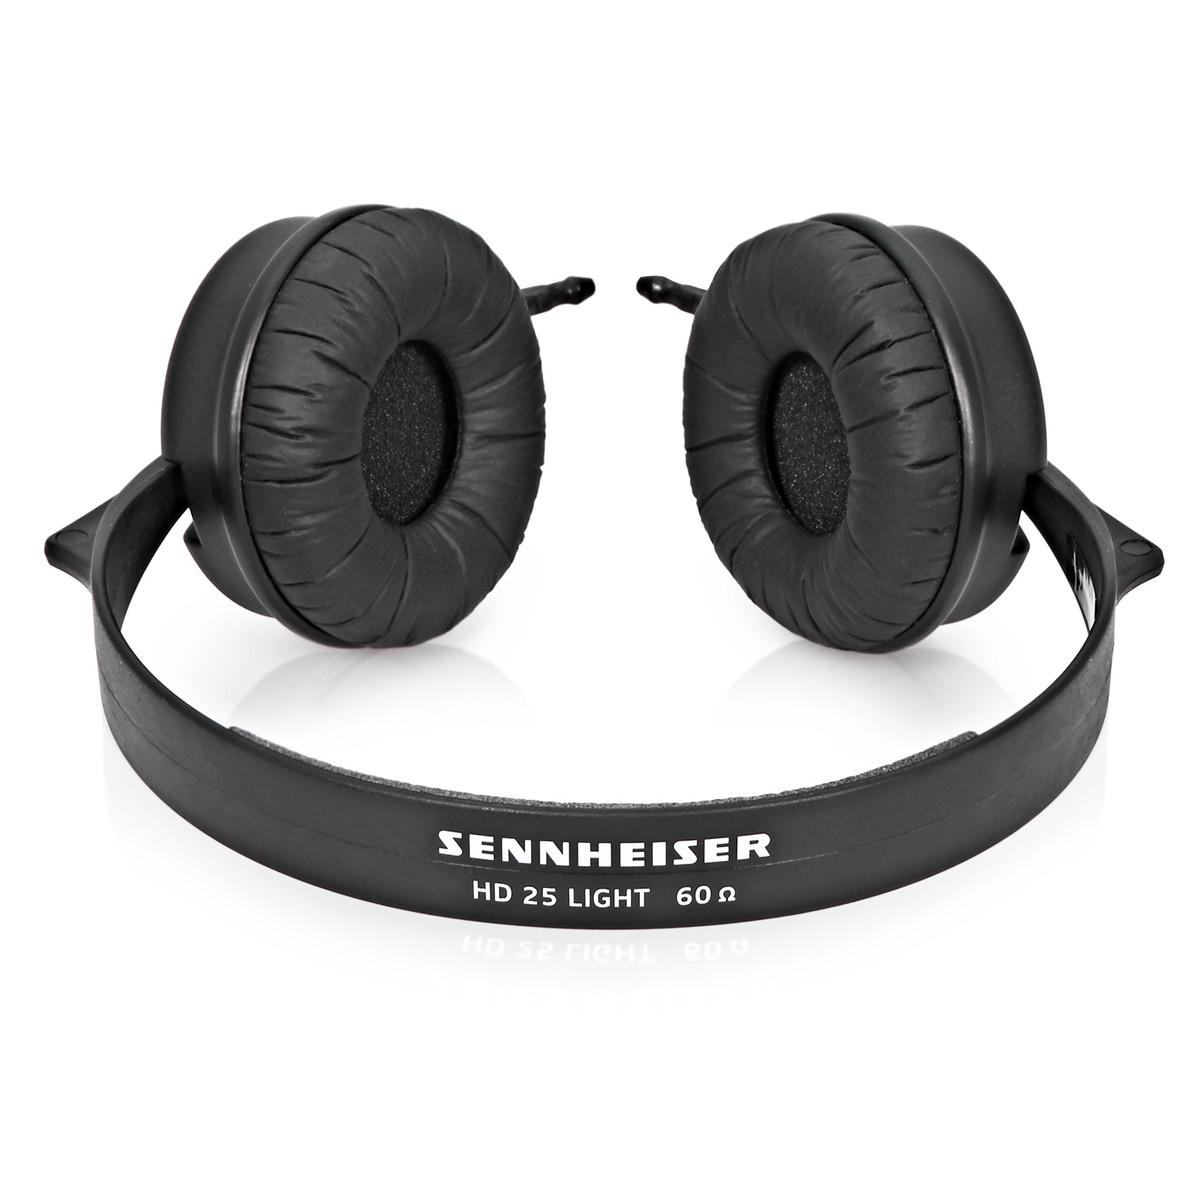 sennheiser hd 25 light headphones at gear4music. Black Bedroom Furniture Sets. Home Design Ideas